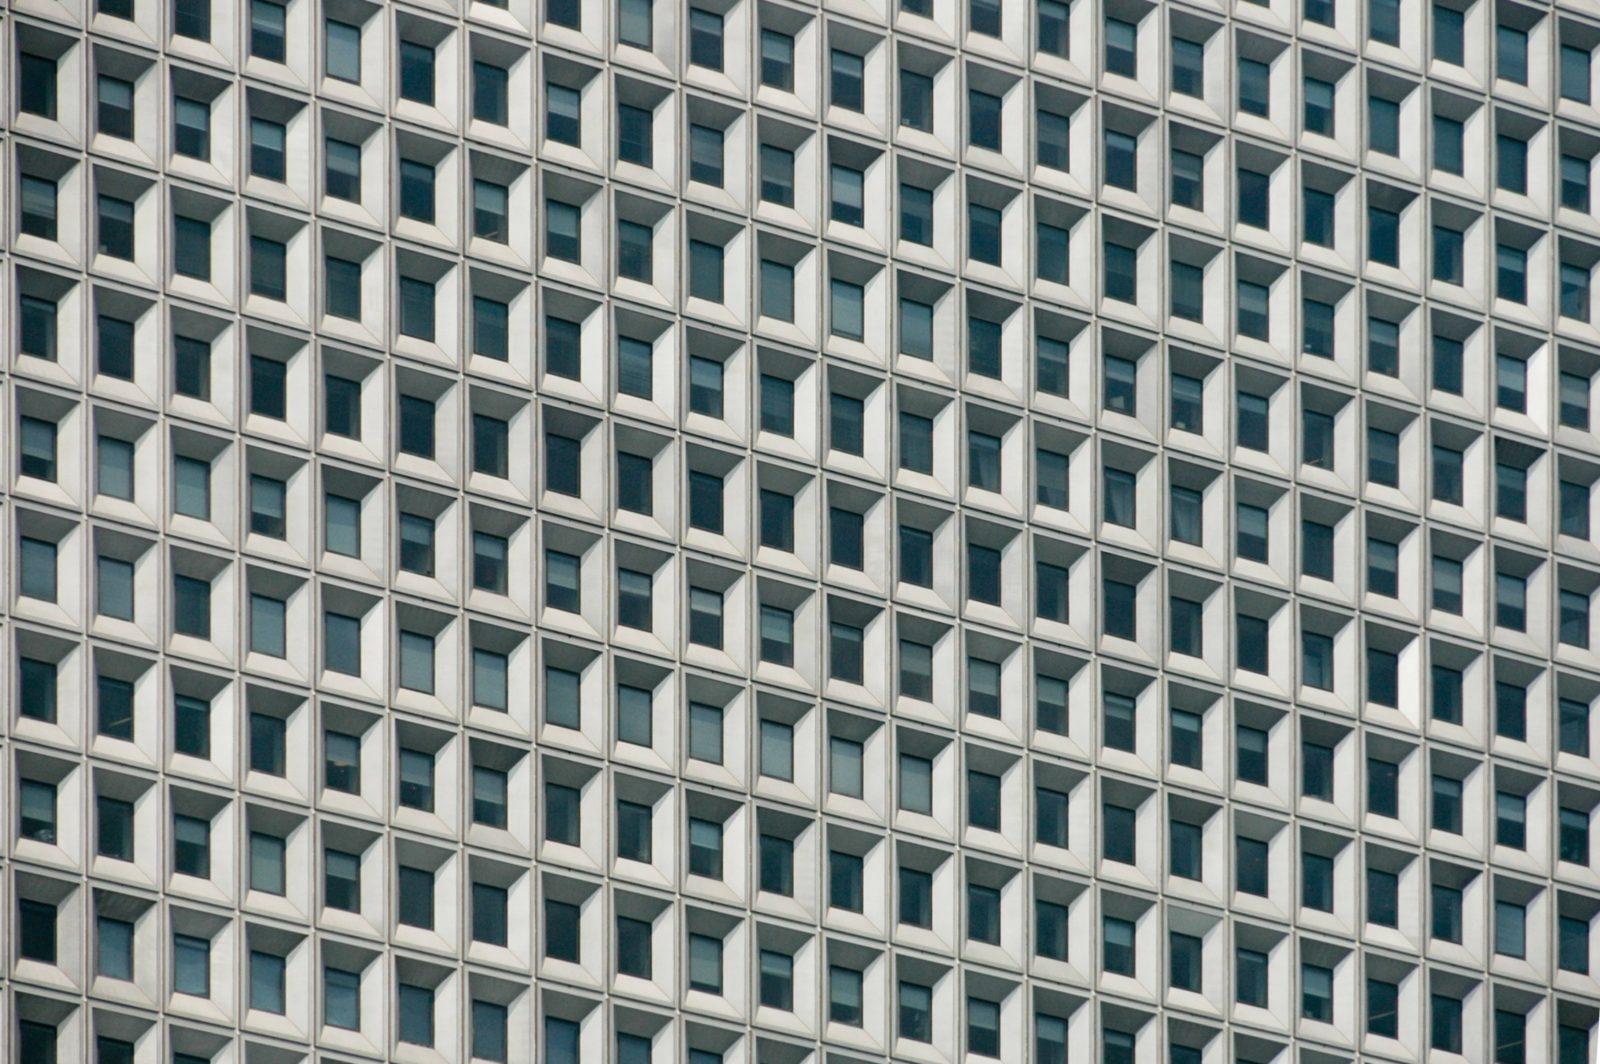 Skyscraper Windows close-up pattern